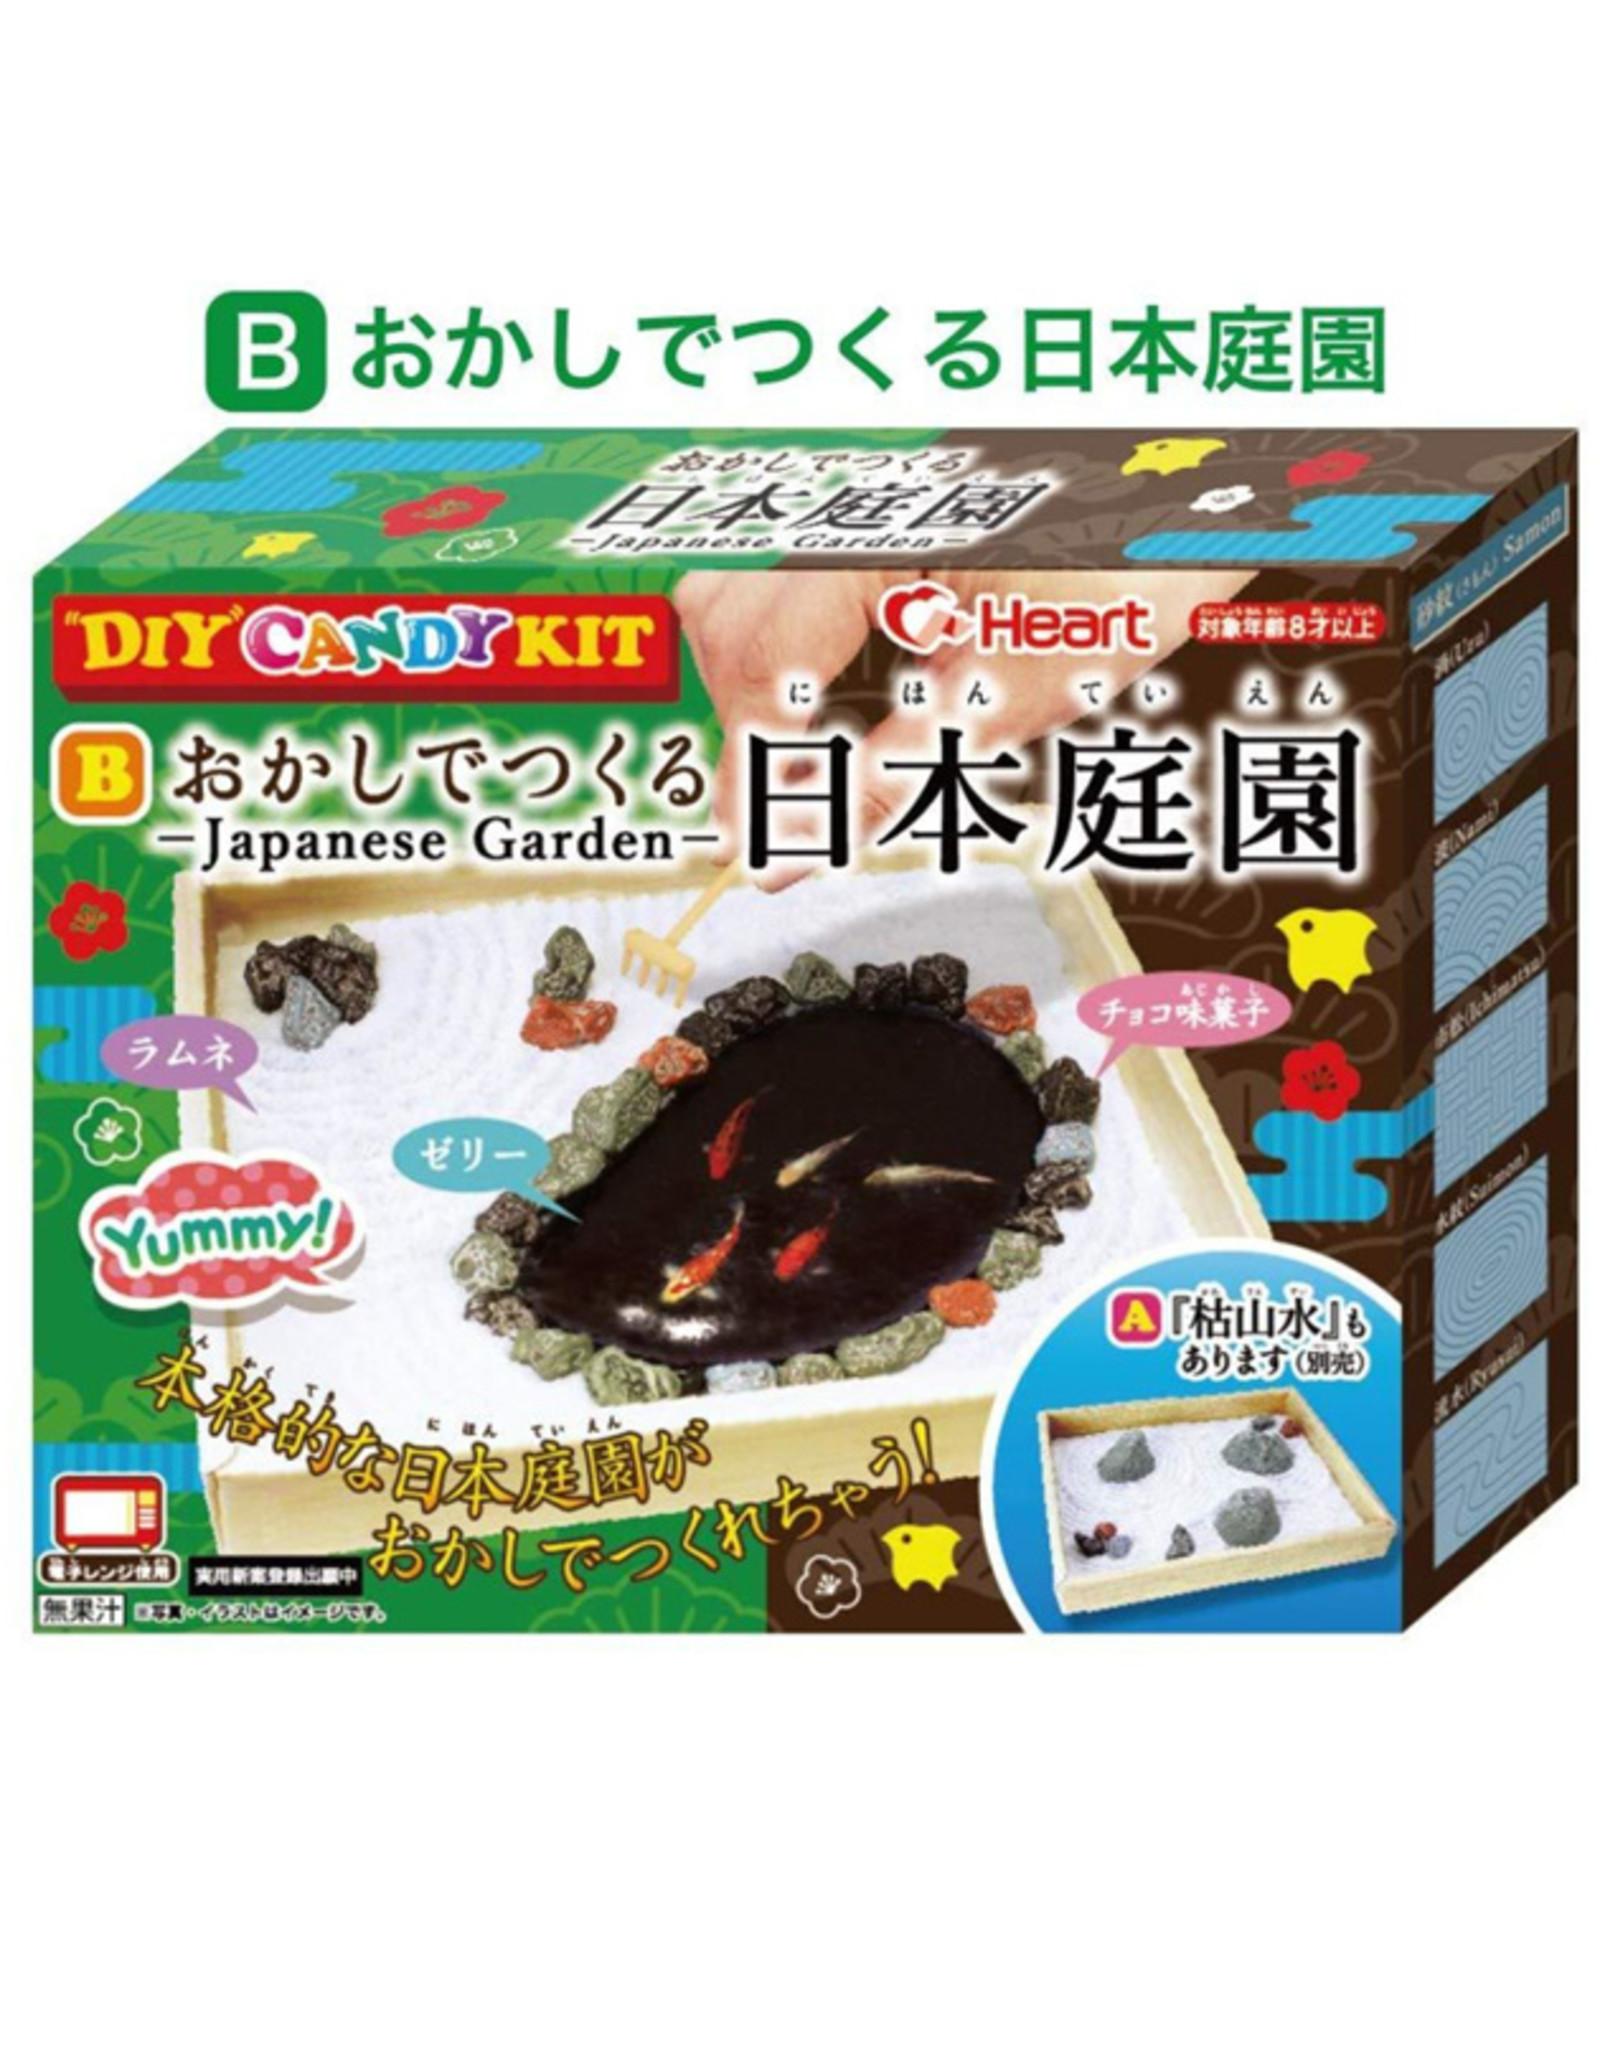 DIY Candy Kit - Japanese Garden